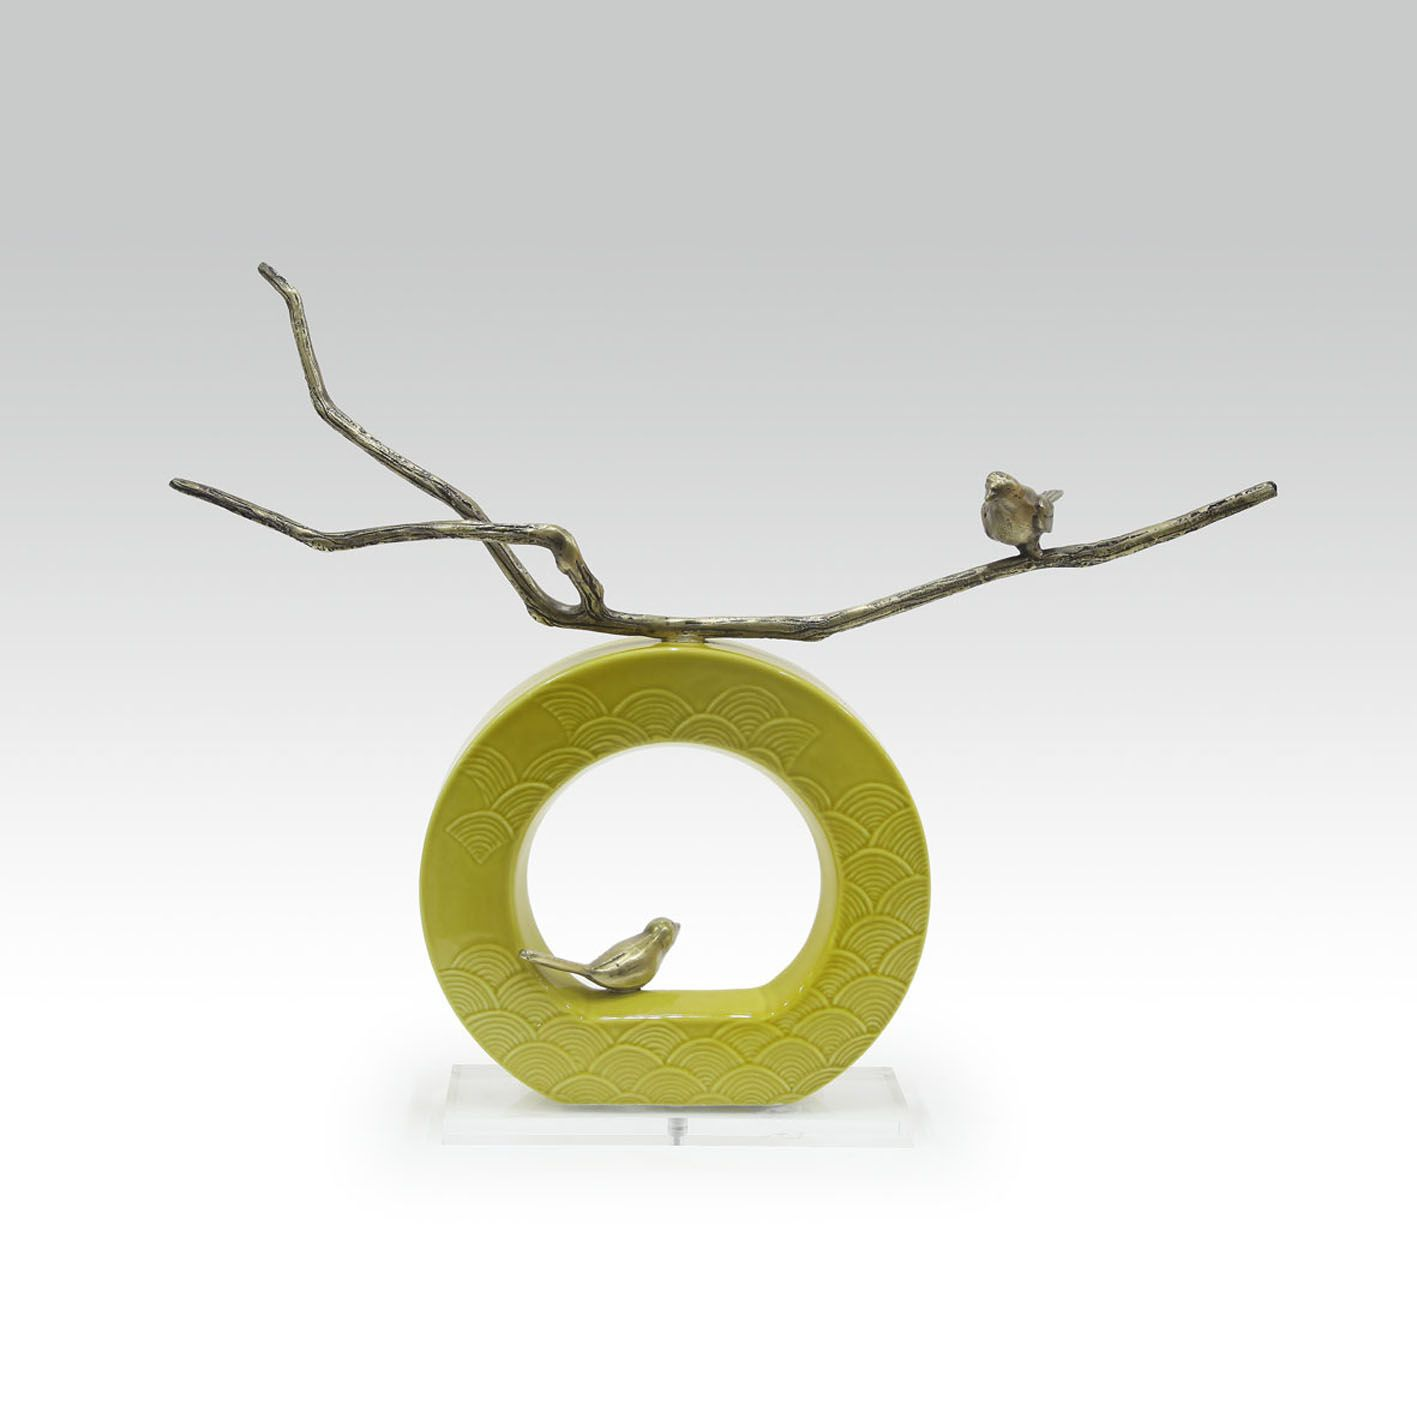 ceramic sculpture deco furniture branch bird 装饰 陶瓷 书法 摆件 屏风 鸟 透明 金属